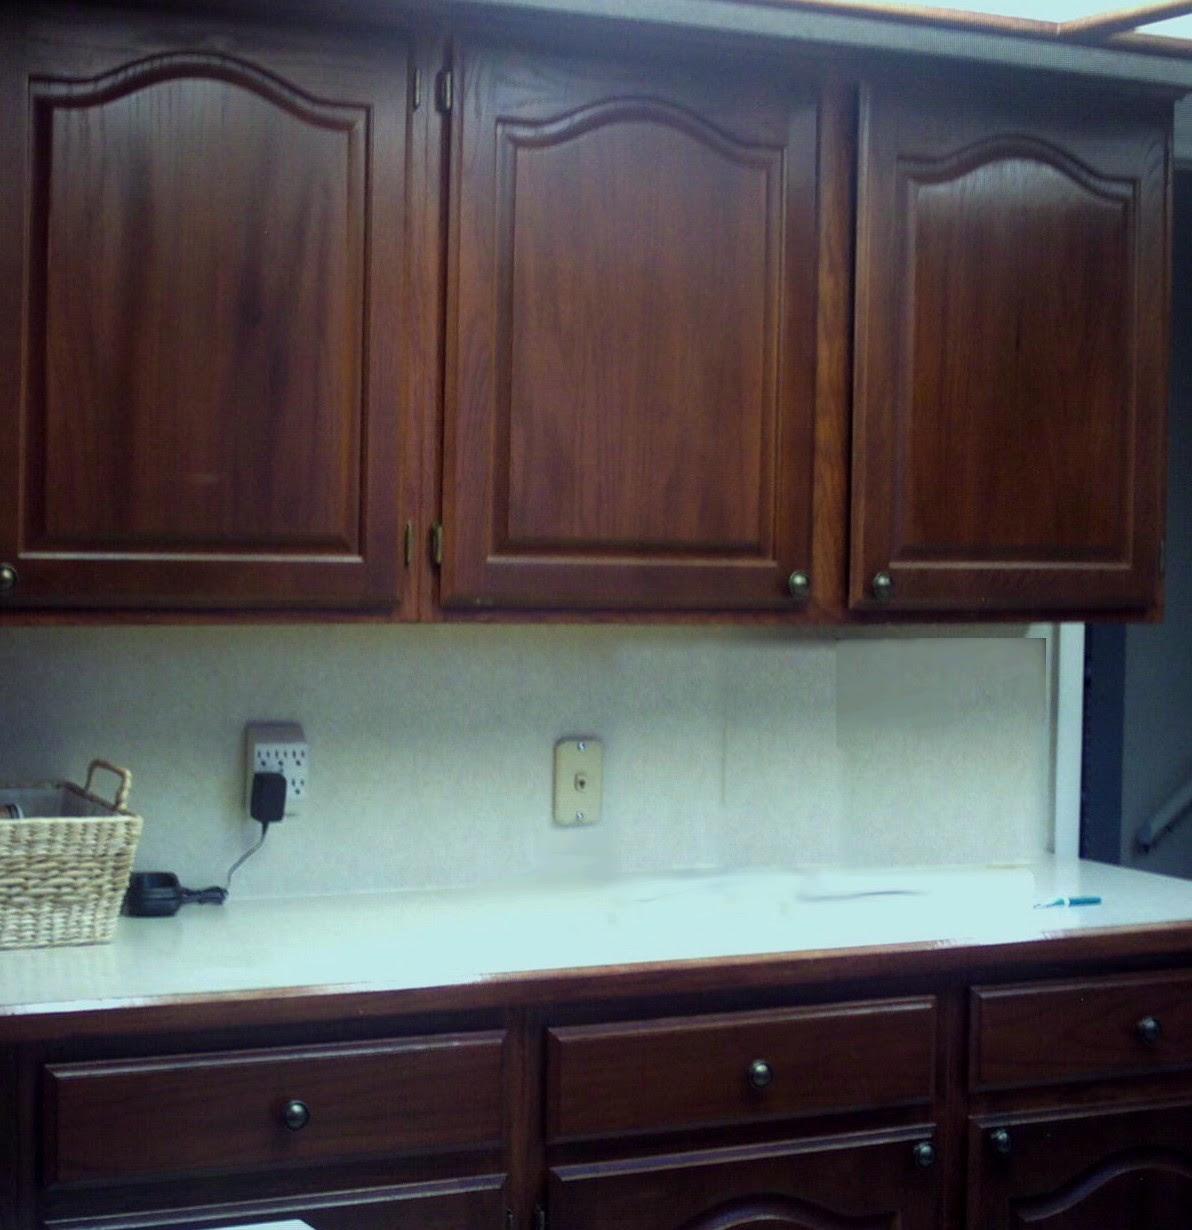 Cool Bedroom Designs For Guys: Darkish Kitchen Cabinets